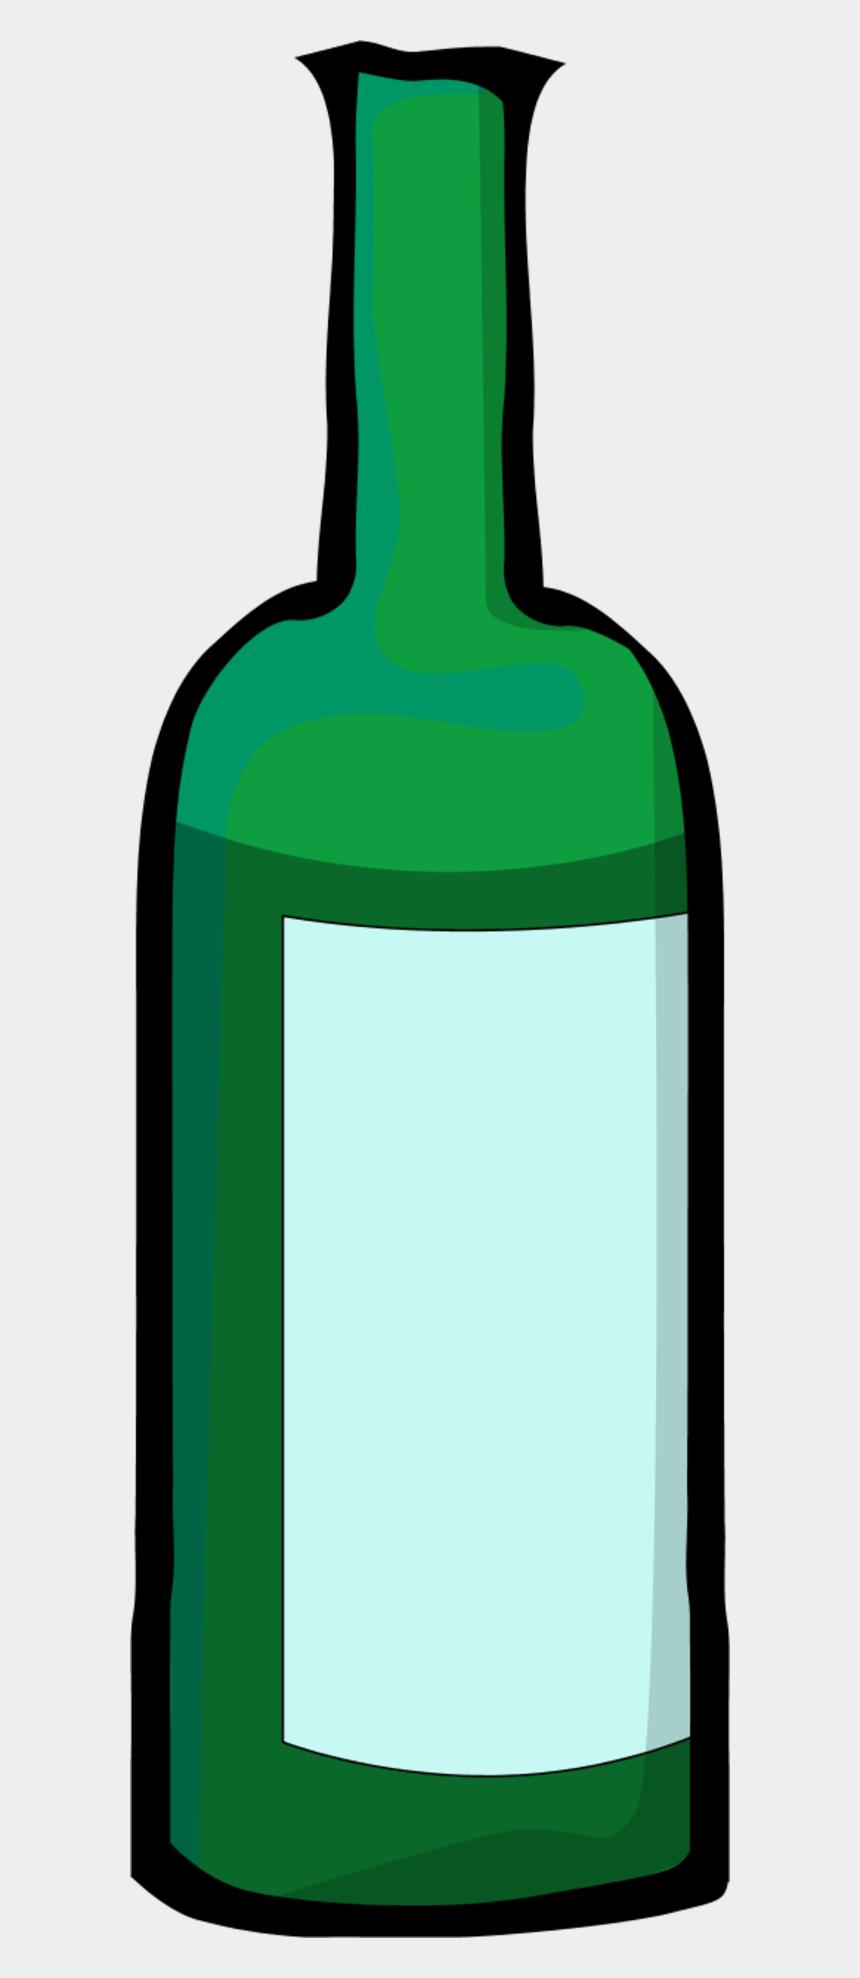 wine bottle clip art, Cartoons - Bottle Clipart Green Bottle - Wine Bottle Clip Art